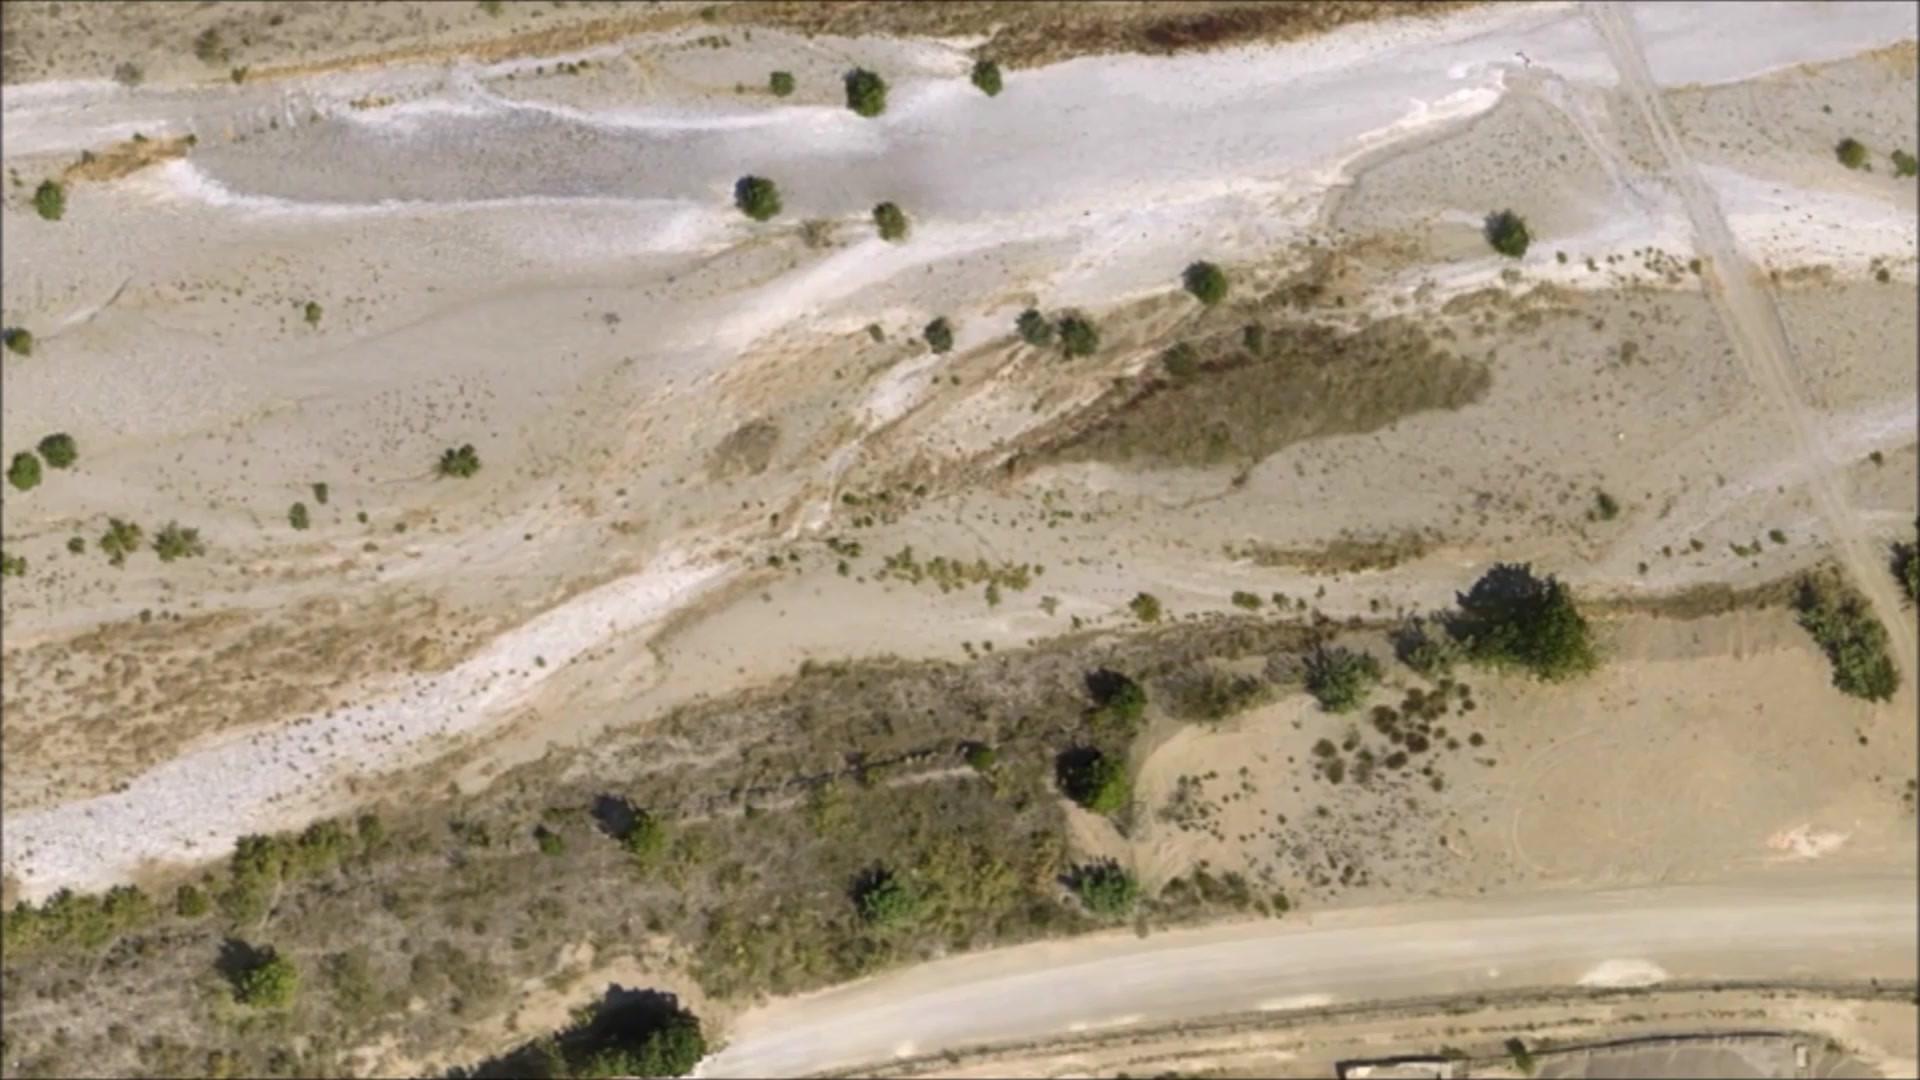 Obtención de ortofotografías e información topográfica de alta resolución en cauces fluviales